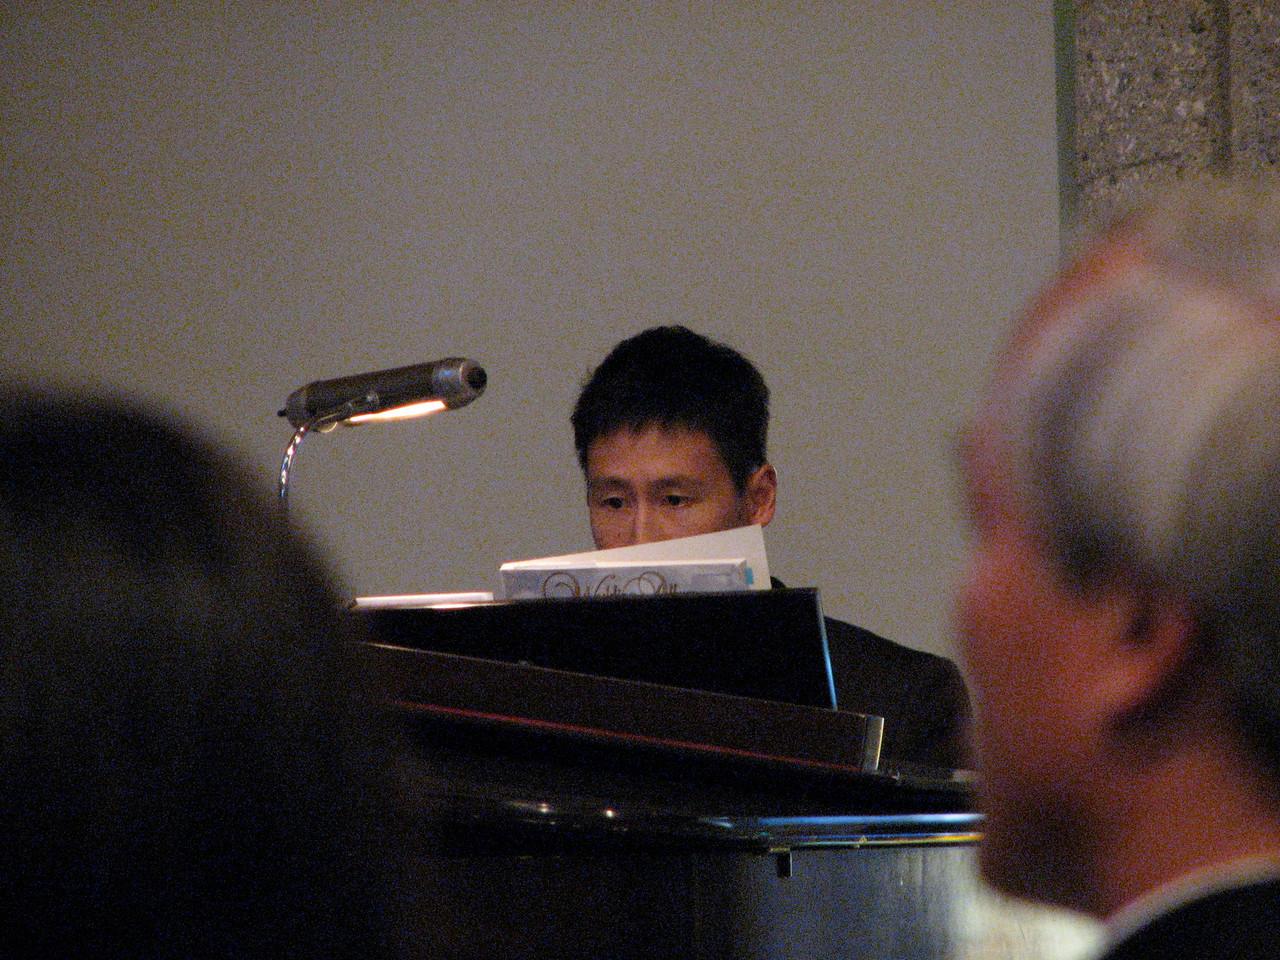 2007 06 09 Sat - Pianist - Dave Lee 2